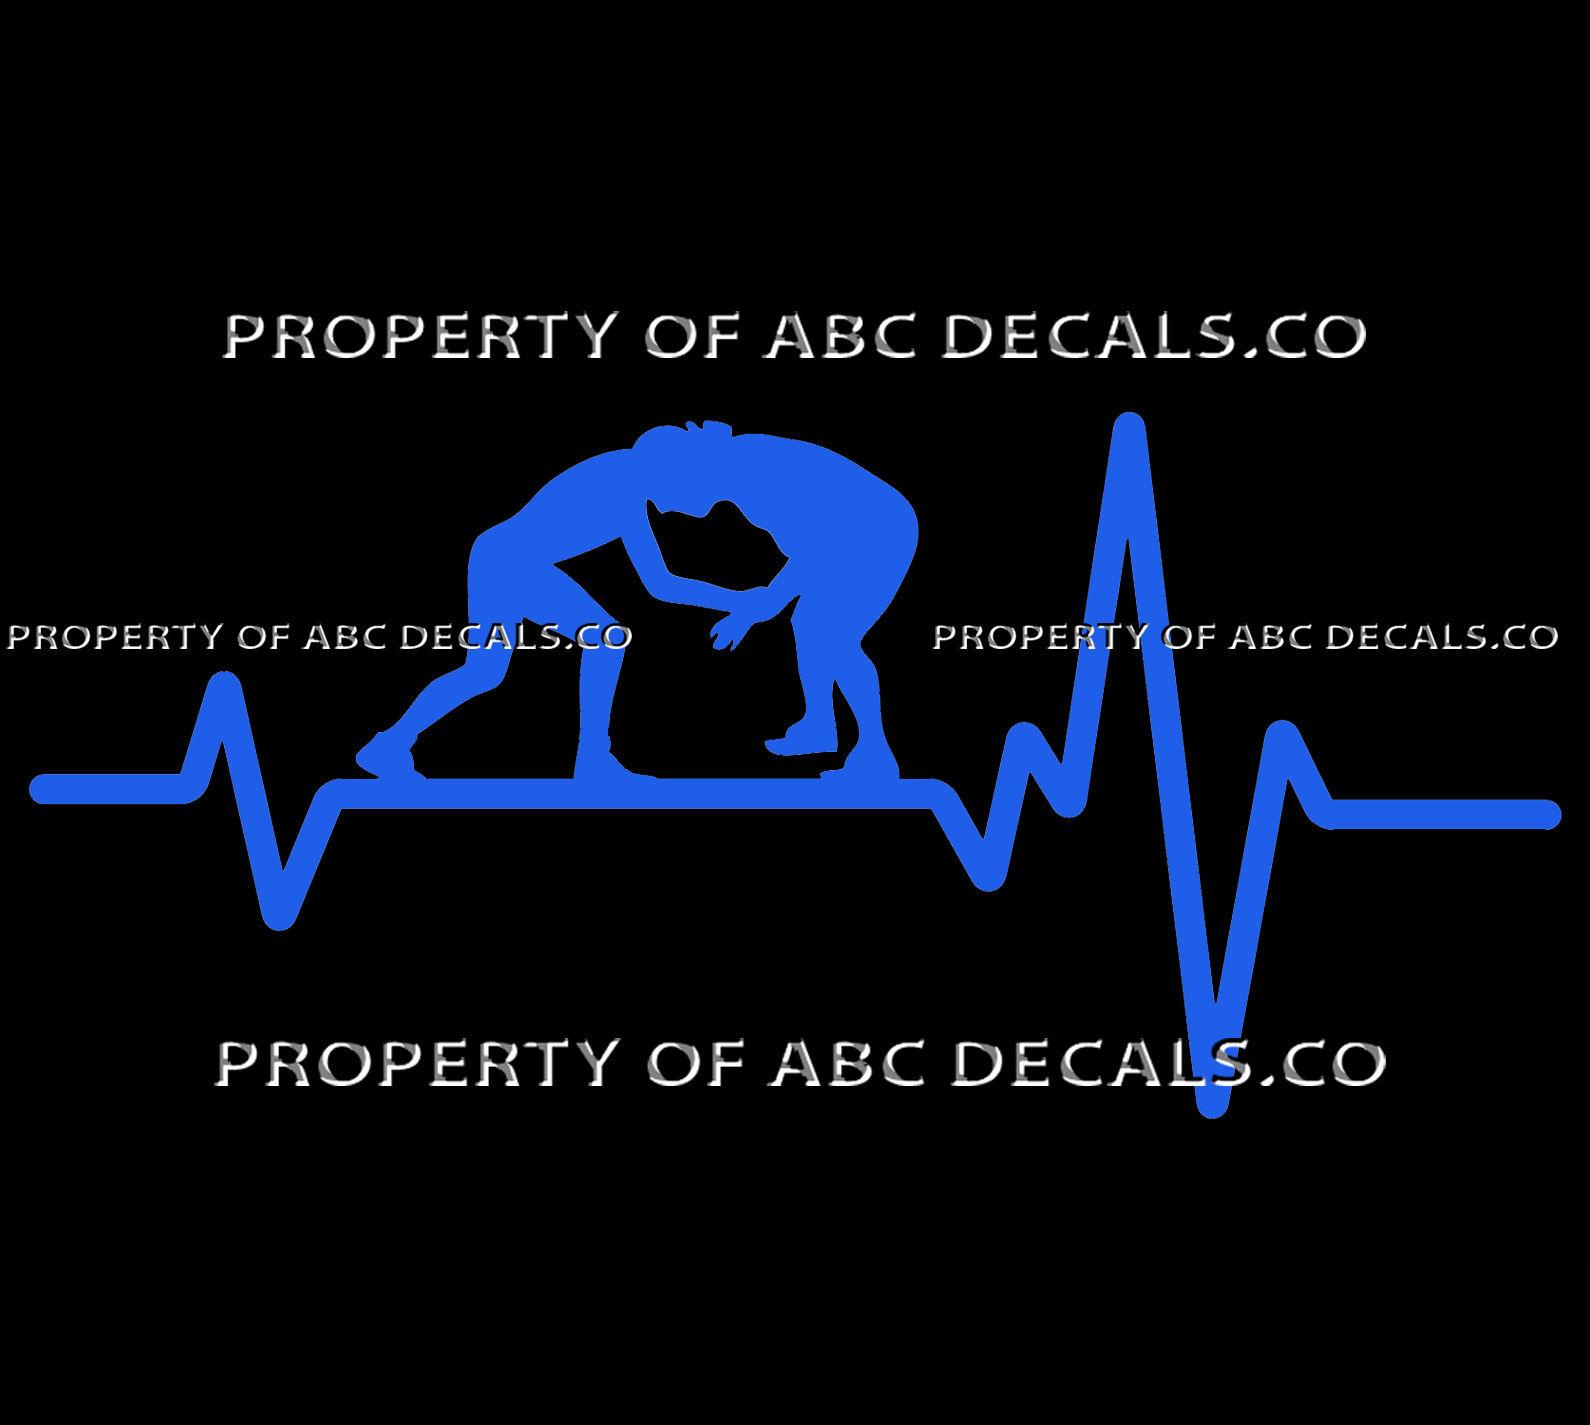 Vrs Heart Beat Line Wrestling Greco Roman Grappling Freestyle Car Vinyl Decal Car Decals Vinyl Vinyl Vinyl Decals [ 1425 x 1590 Pixel ]